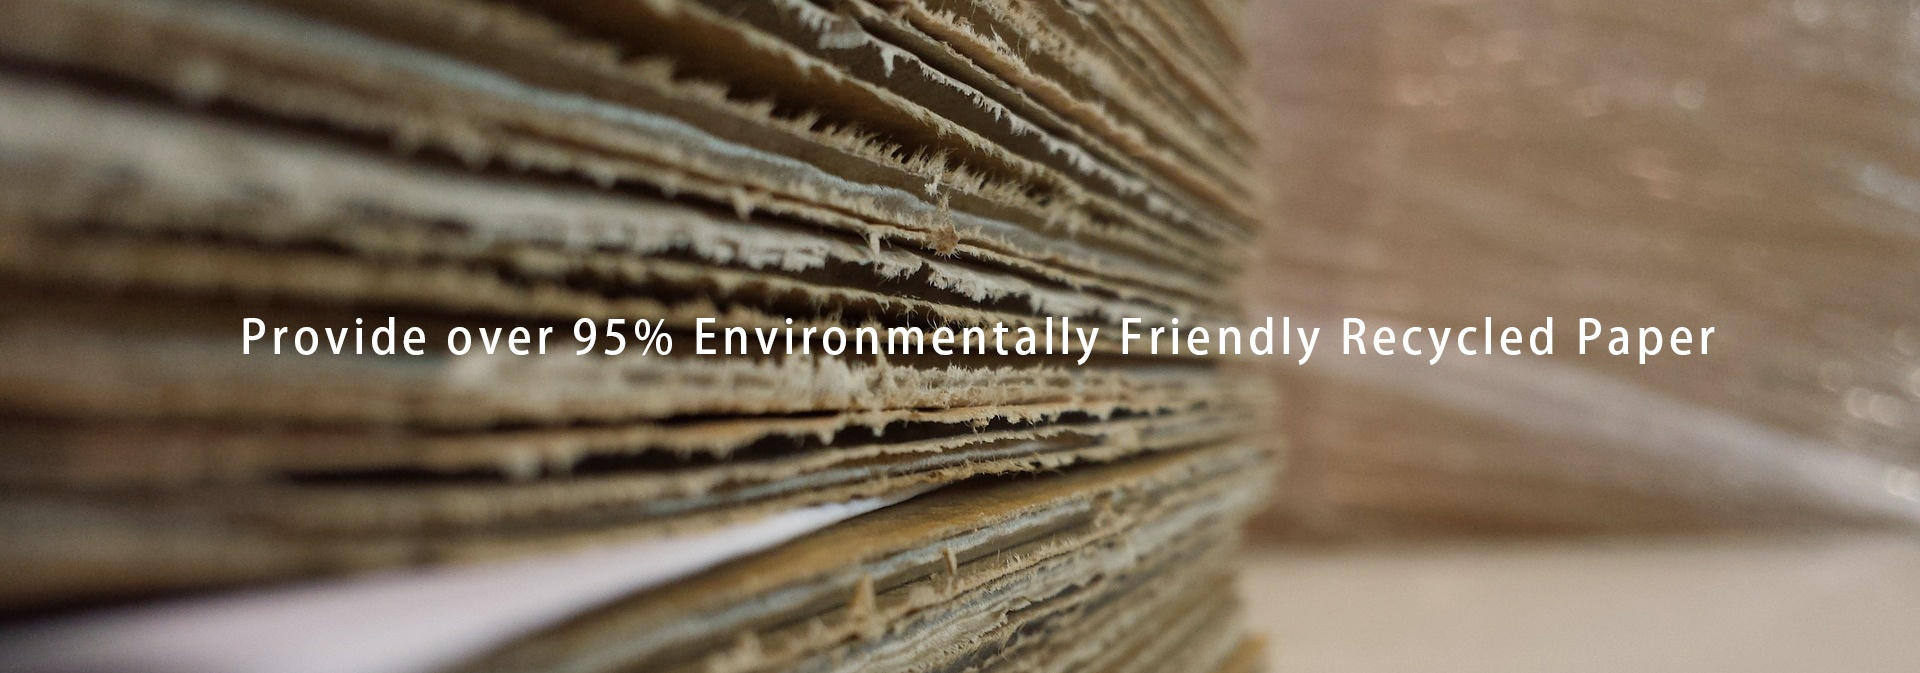 paper-recycle-en